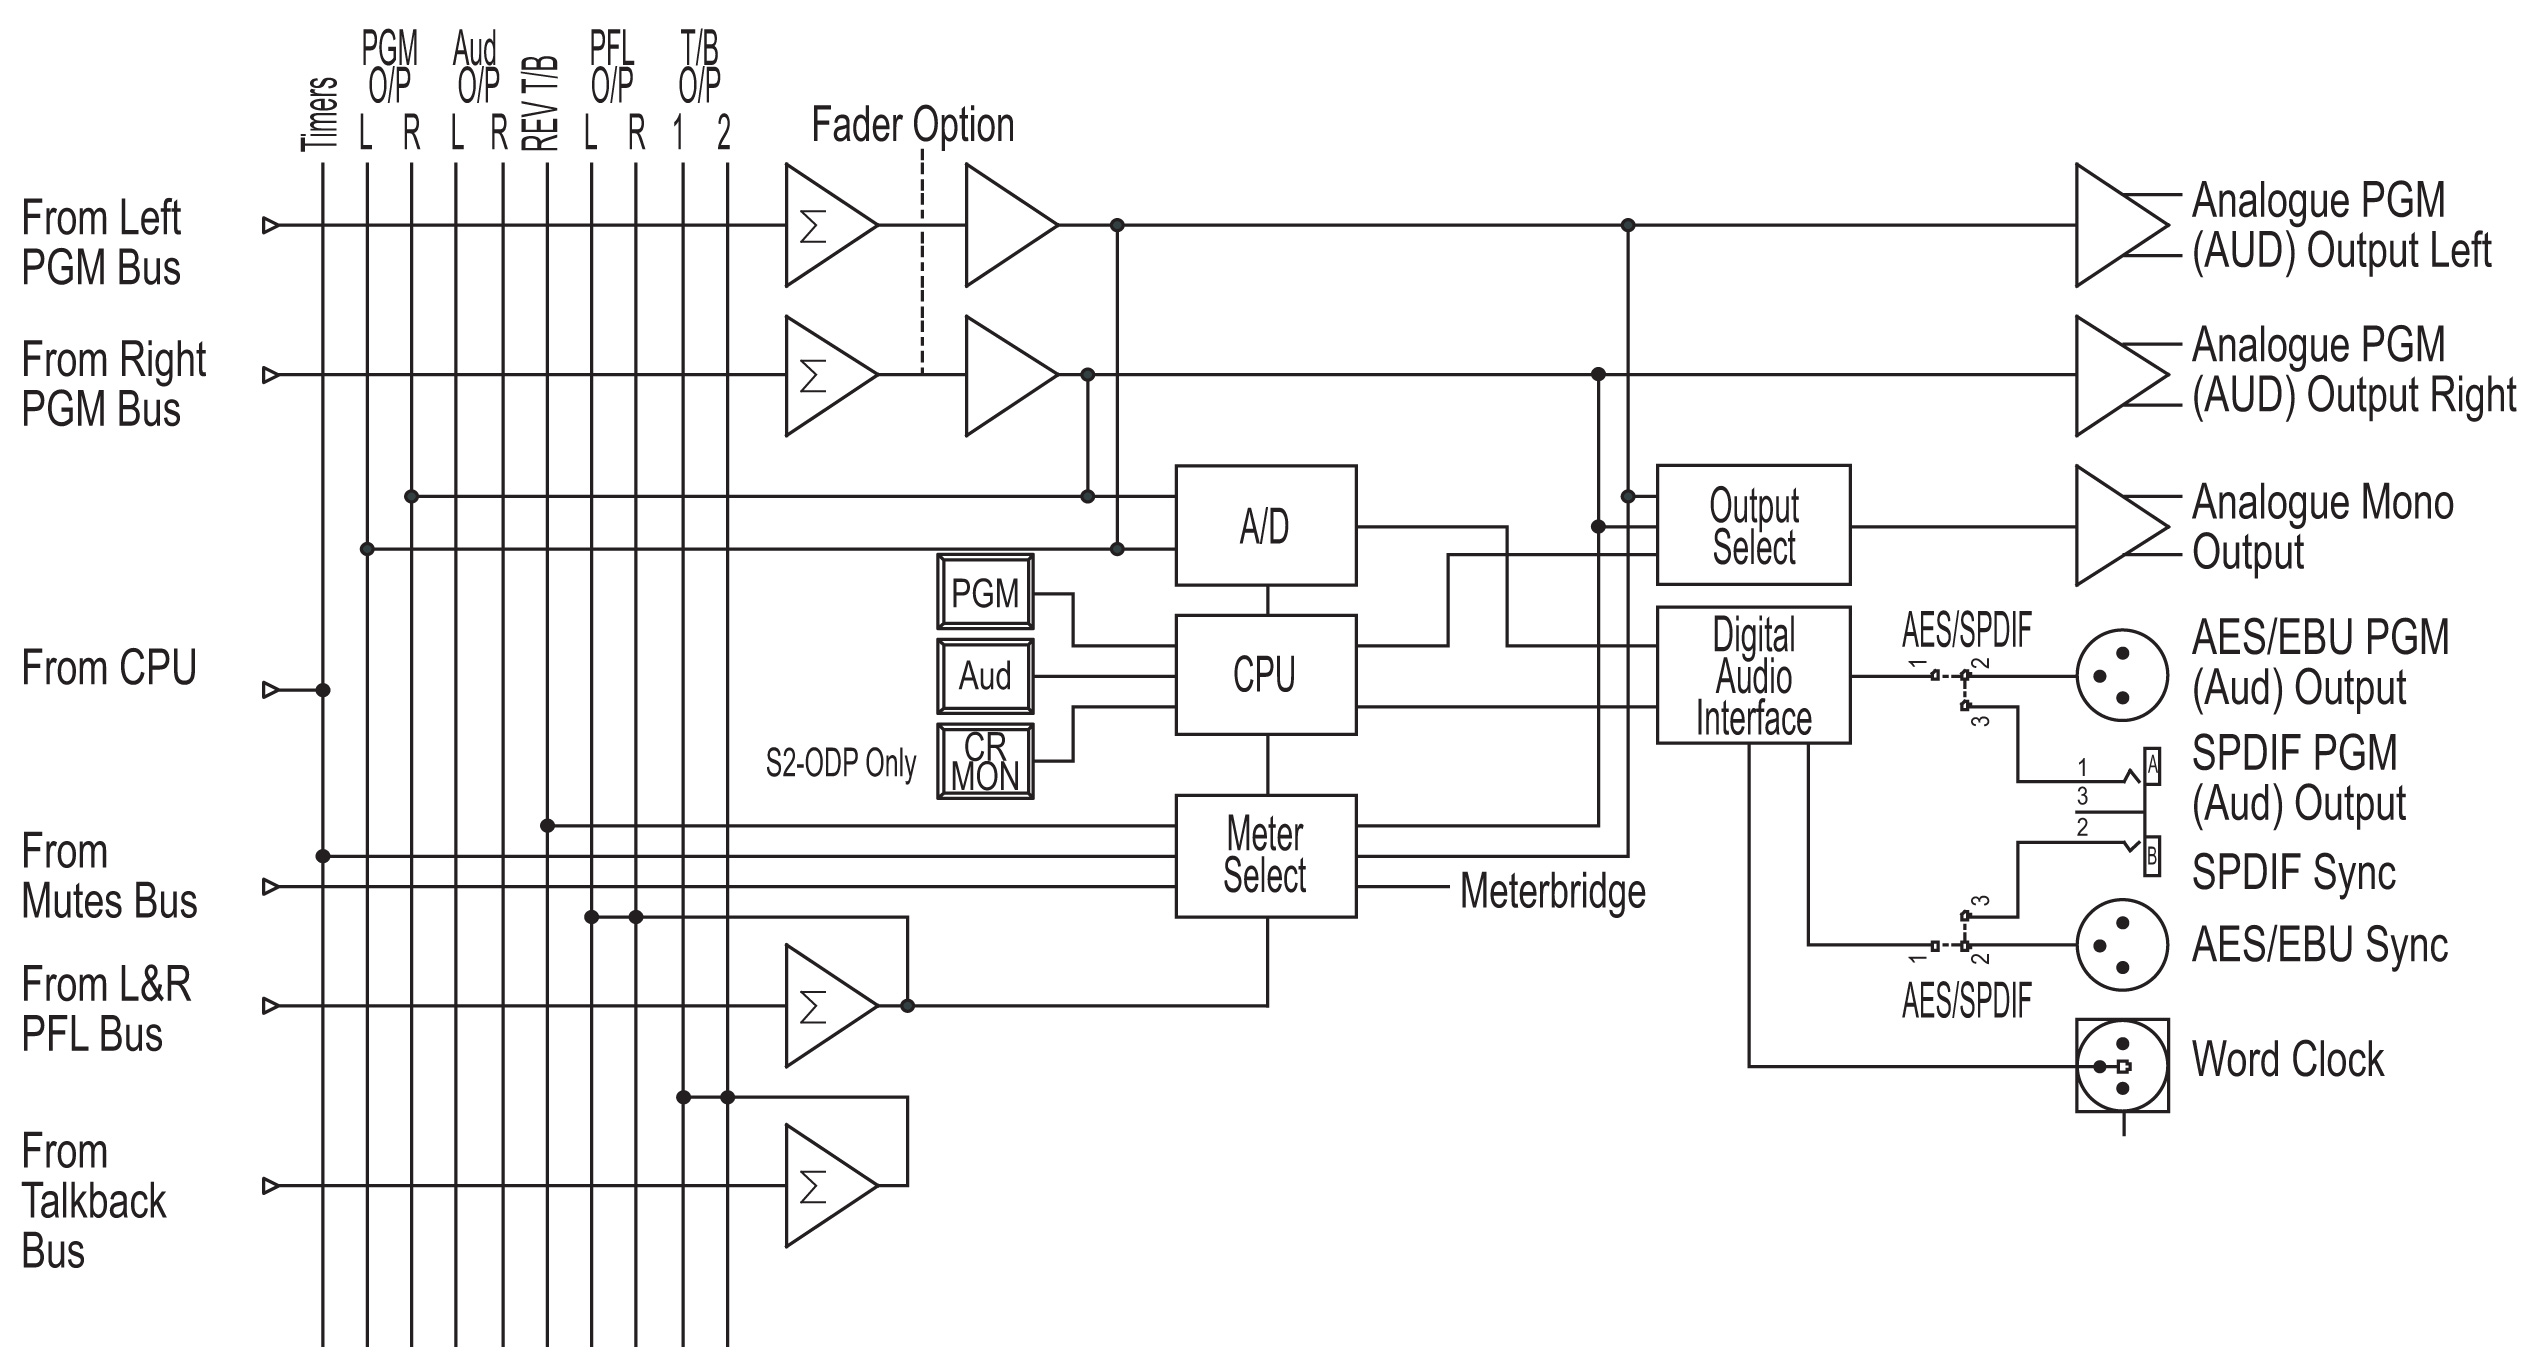 s pdif wiring diagram home studio manual e books Home Camera Wiring Diagram s pdif wiring diagram home studio wiring library